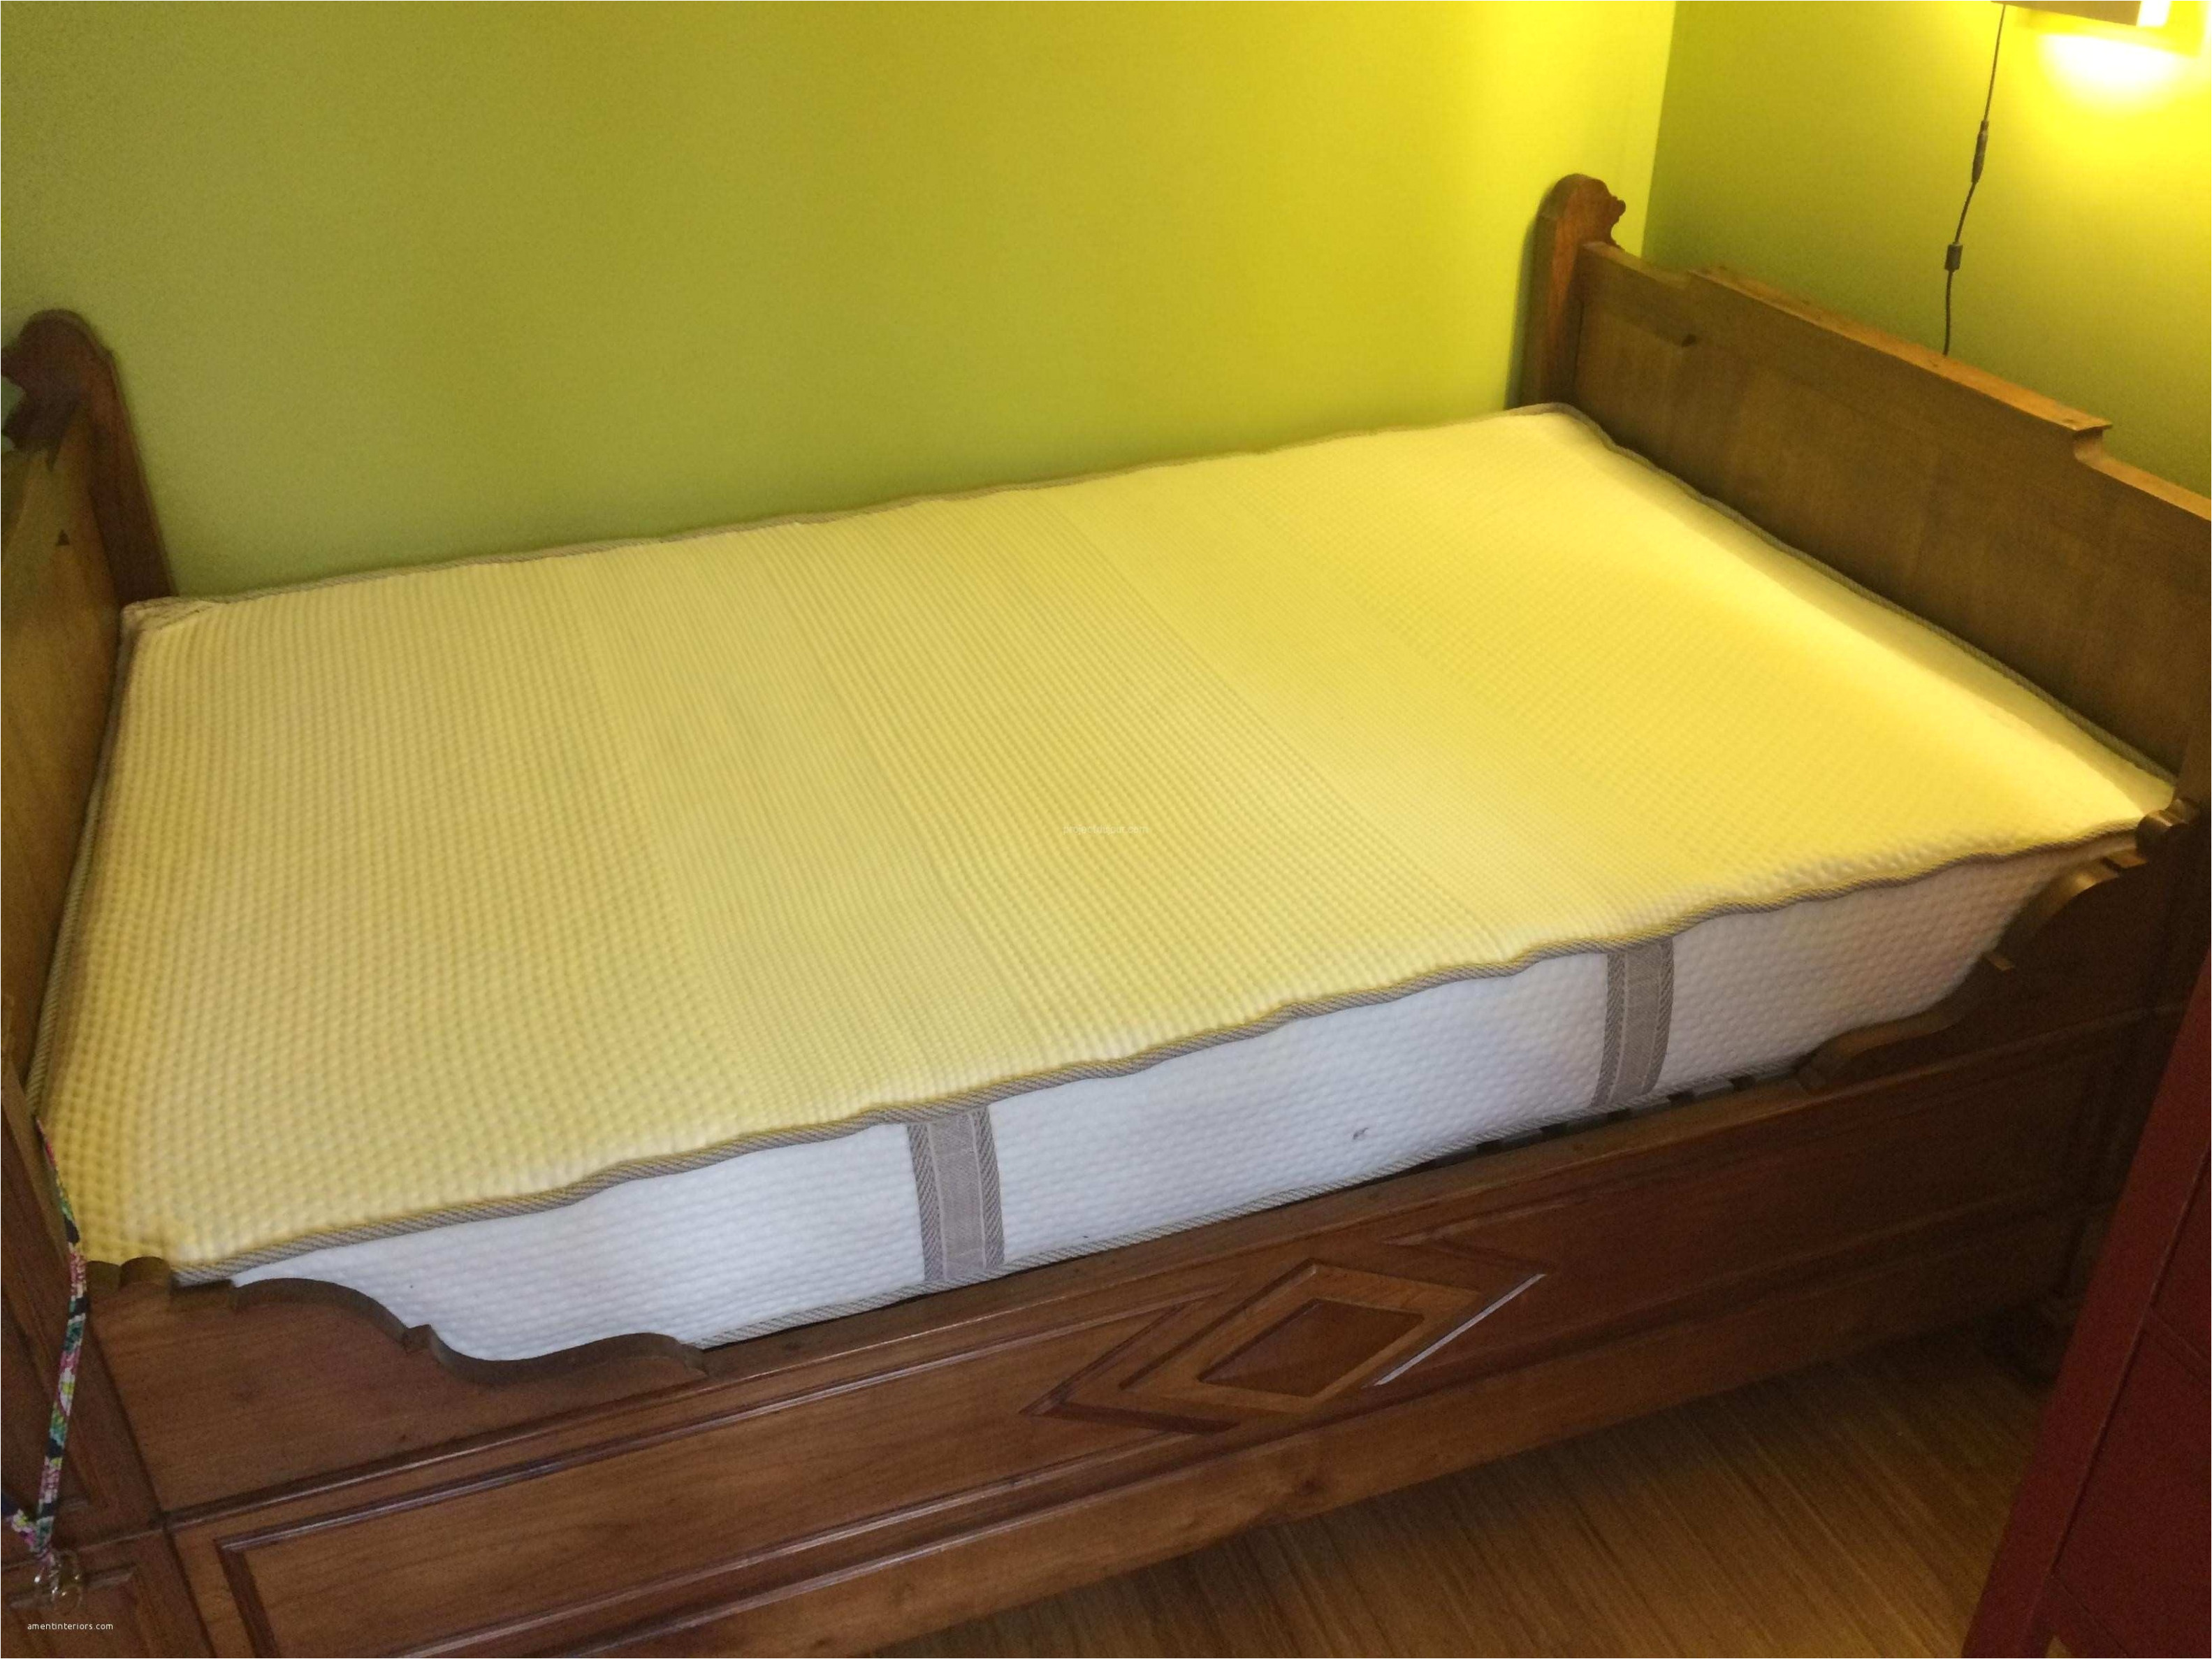 stilvoll 1 80 bett charming ikea king bed frame with boxspring elegant beautiful